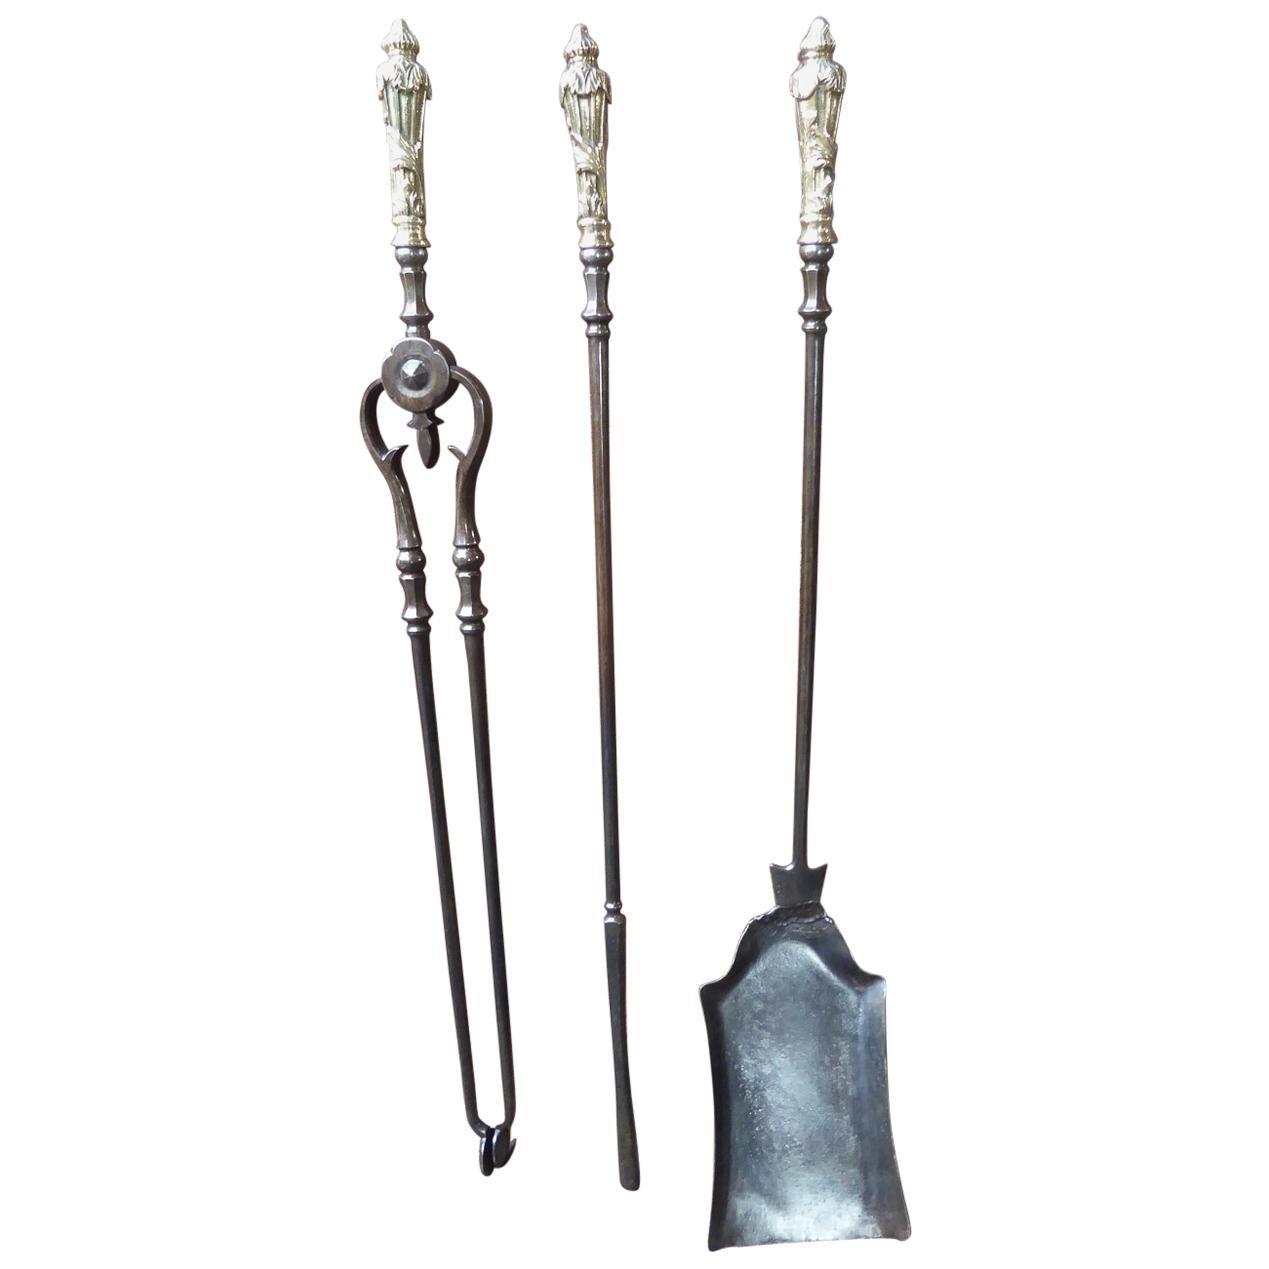 19th Century English Victorian Fireplace Tool Set or Companion Set